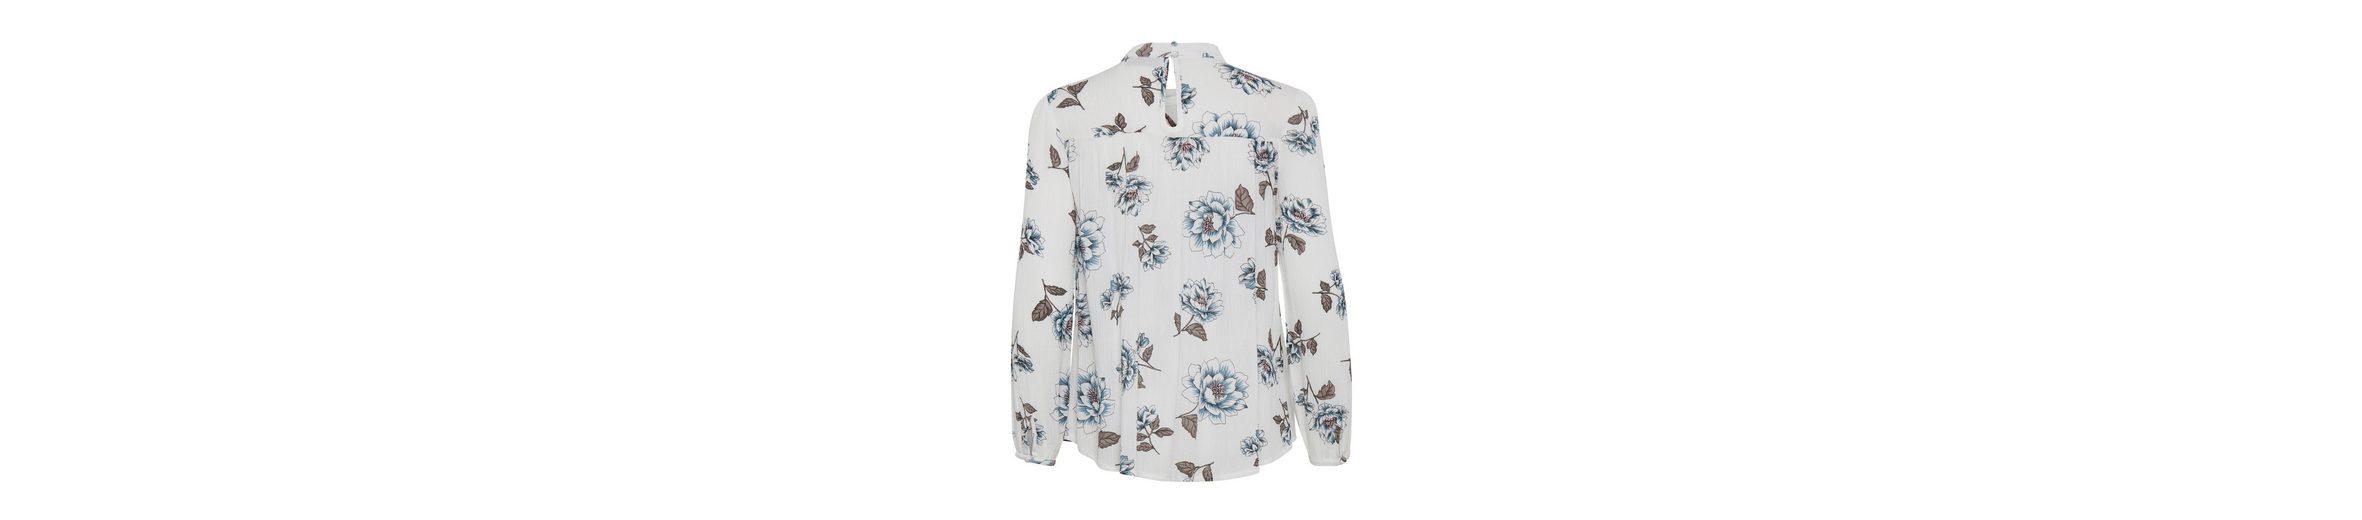 fransa Shirtbluse Mavisk Heißen Verkauf Online-Verkauf 80S5JdxRIP